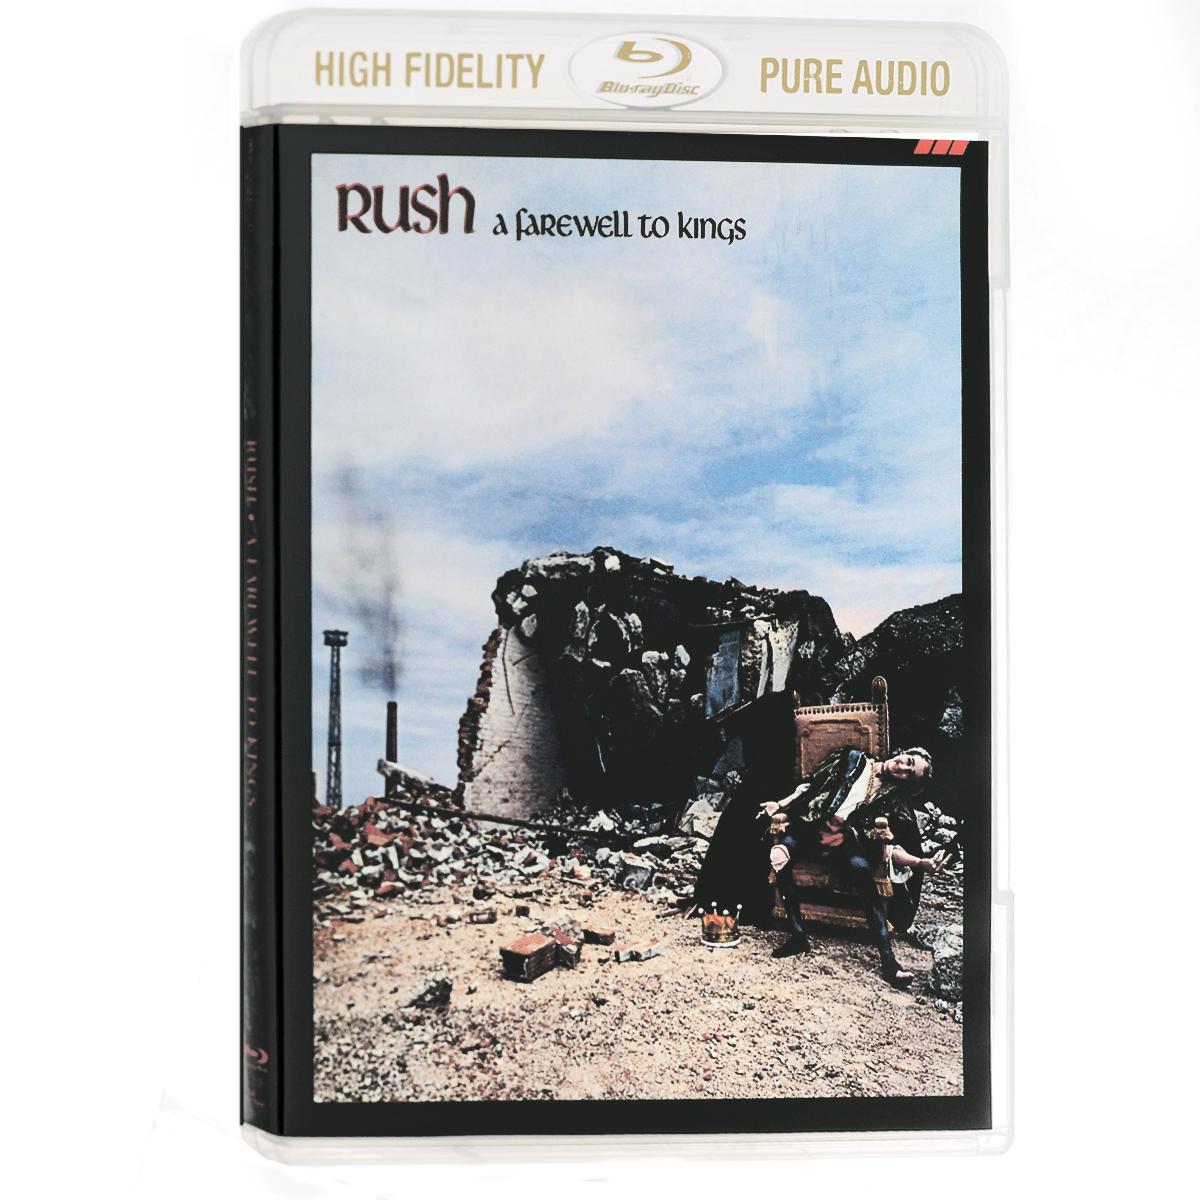 Rush Rush. A Farewell To Kings (Blu-Ray Audio) rush rush 2112 deluxe edition cd blu ray